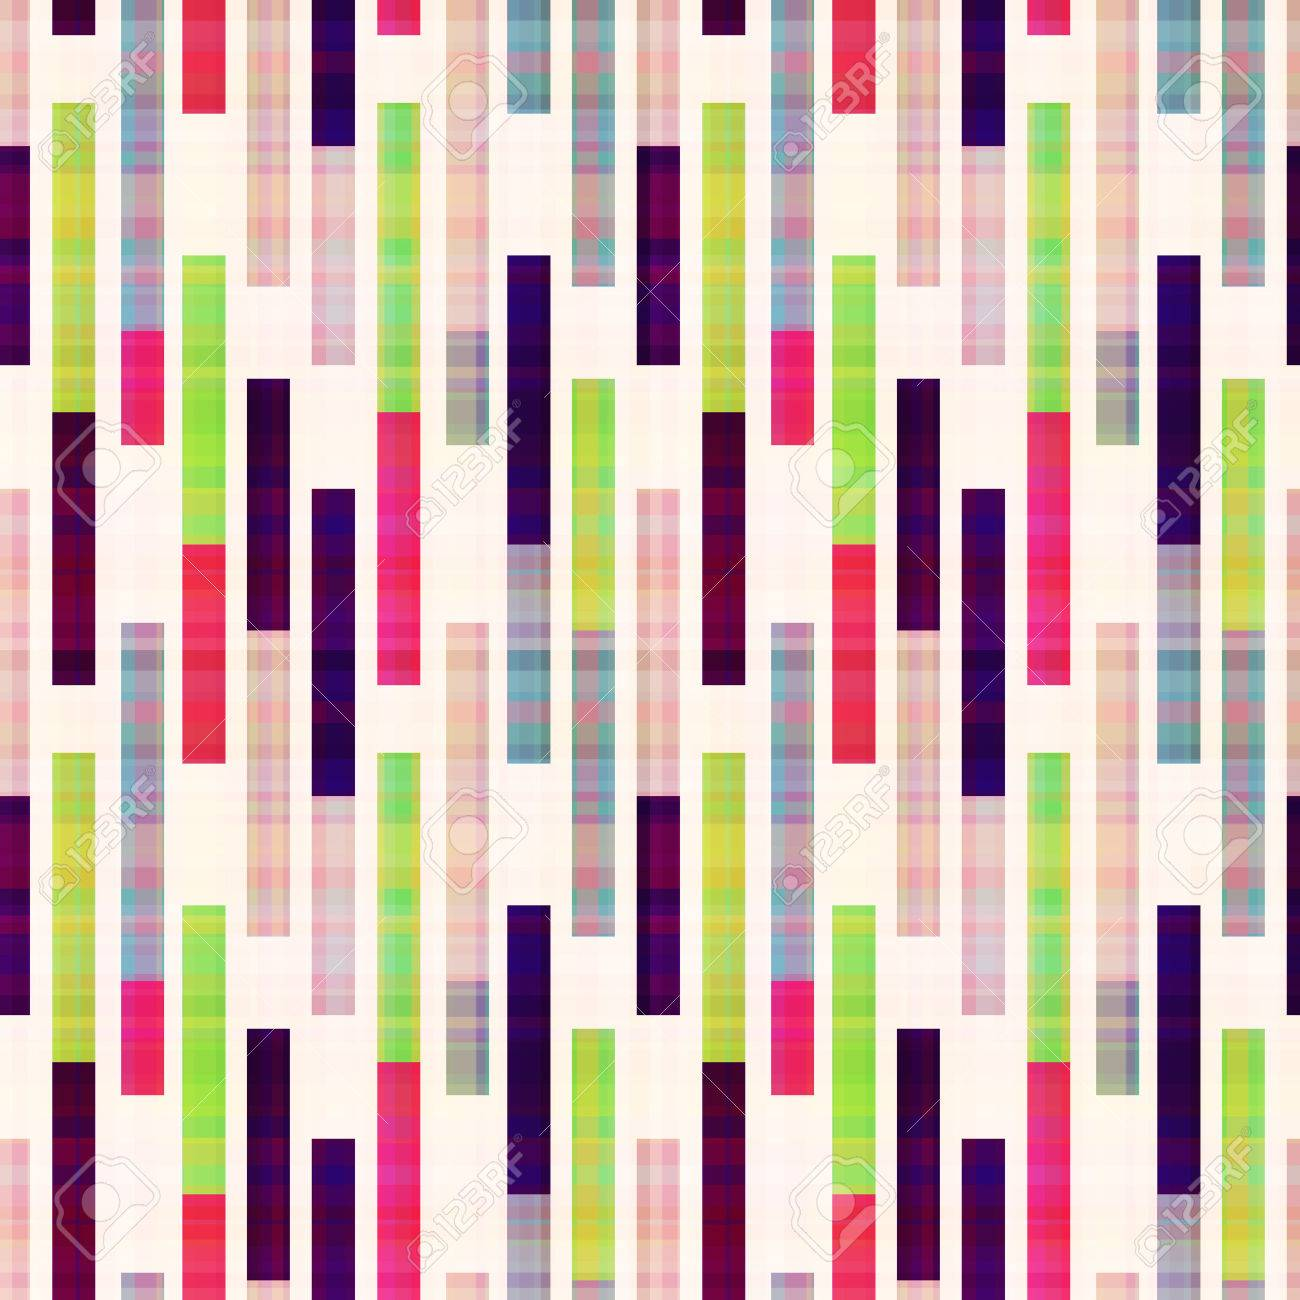 seamless abstract geometric striped pattern - 22386738